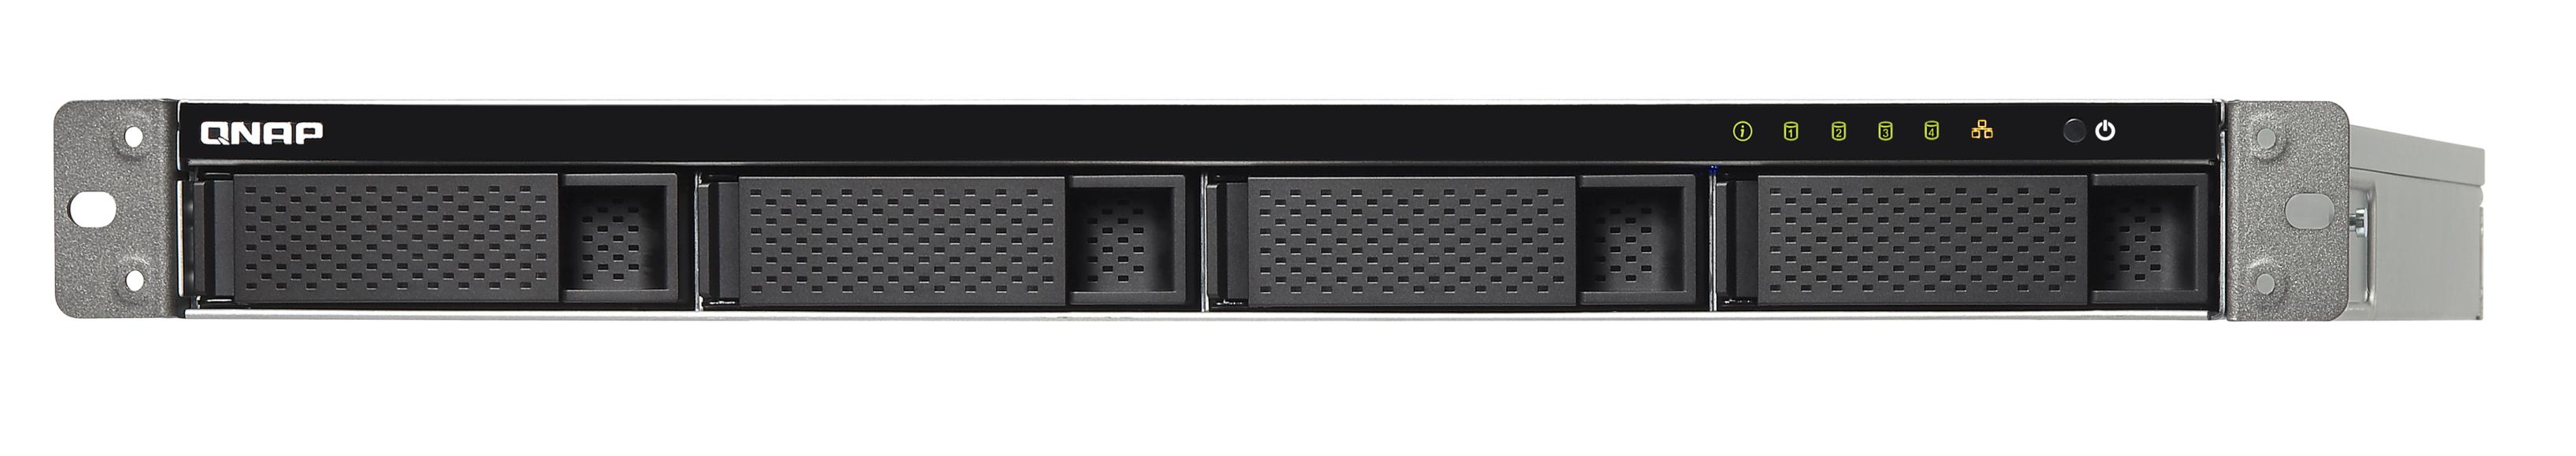 QNAP TS-431XU (1,7GHz/2GB RAM/4xSATA/10GbE SFP+)